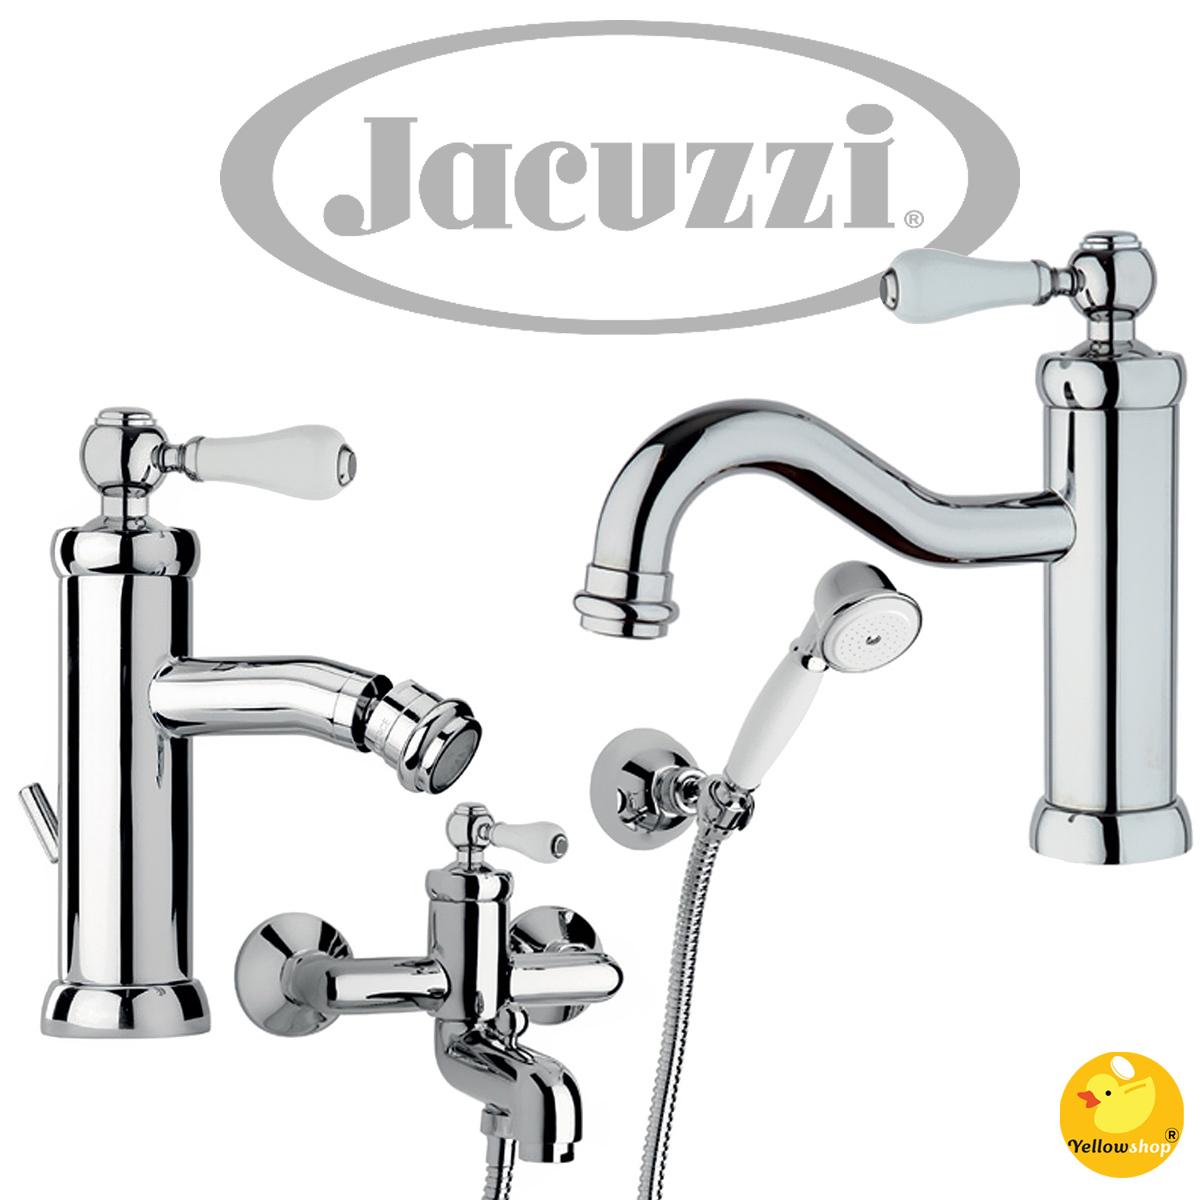 Yellowshop Miscelatore esterno vasca con kit duplex Jacuzzi mod Tosca